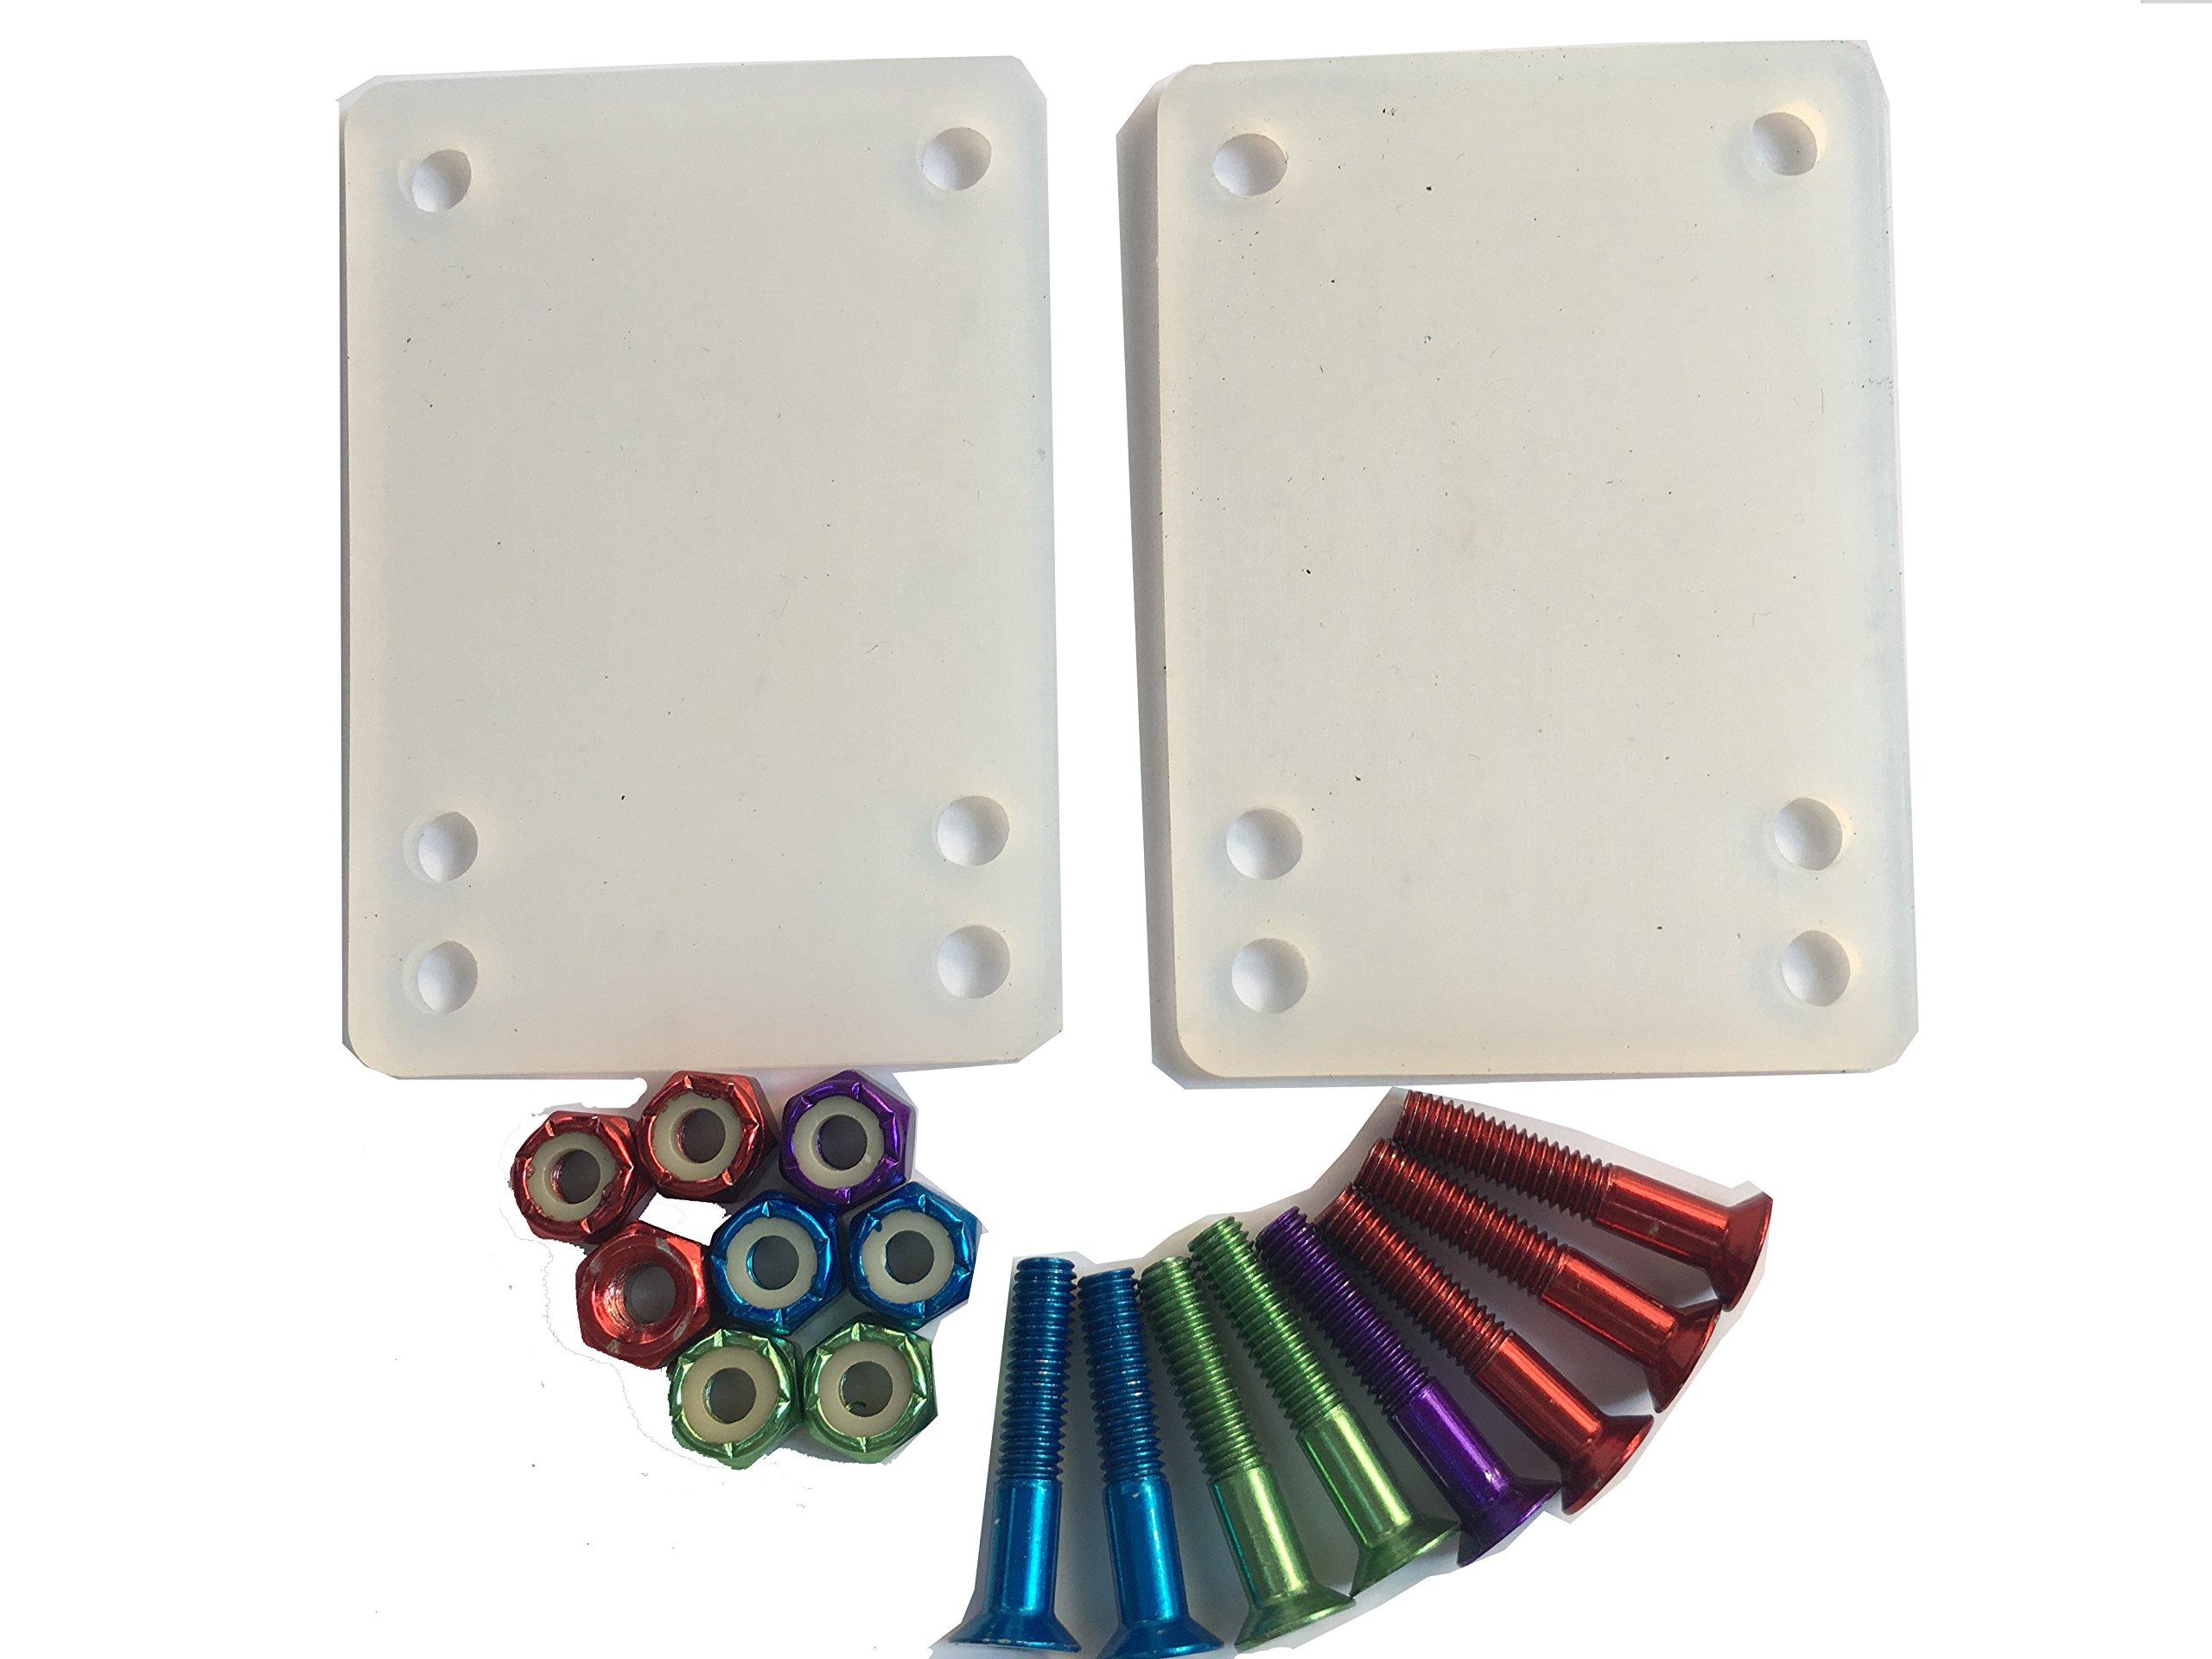 DreamFire Flexiable Rubber Skateboard Riser Pads Hardware Soft Colorful 10 pcs by DreamFire